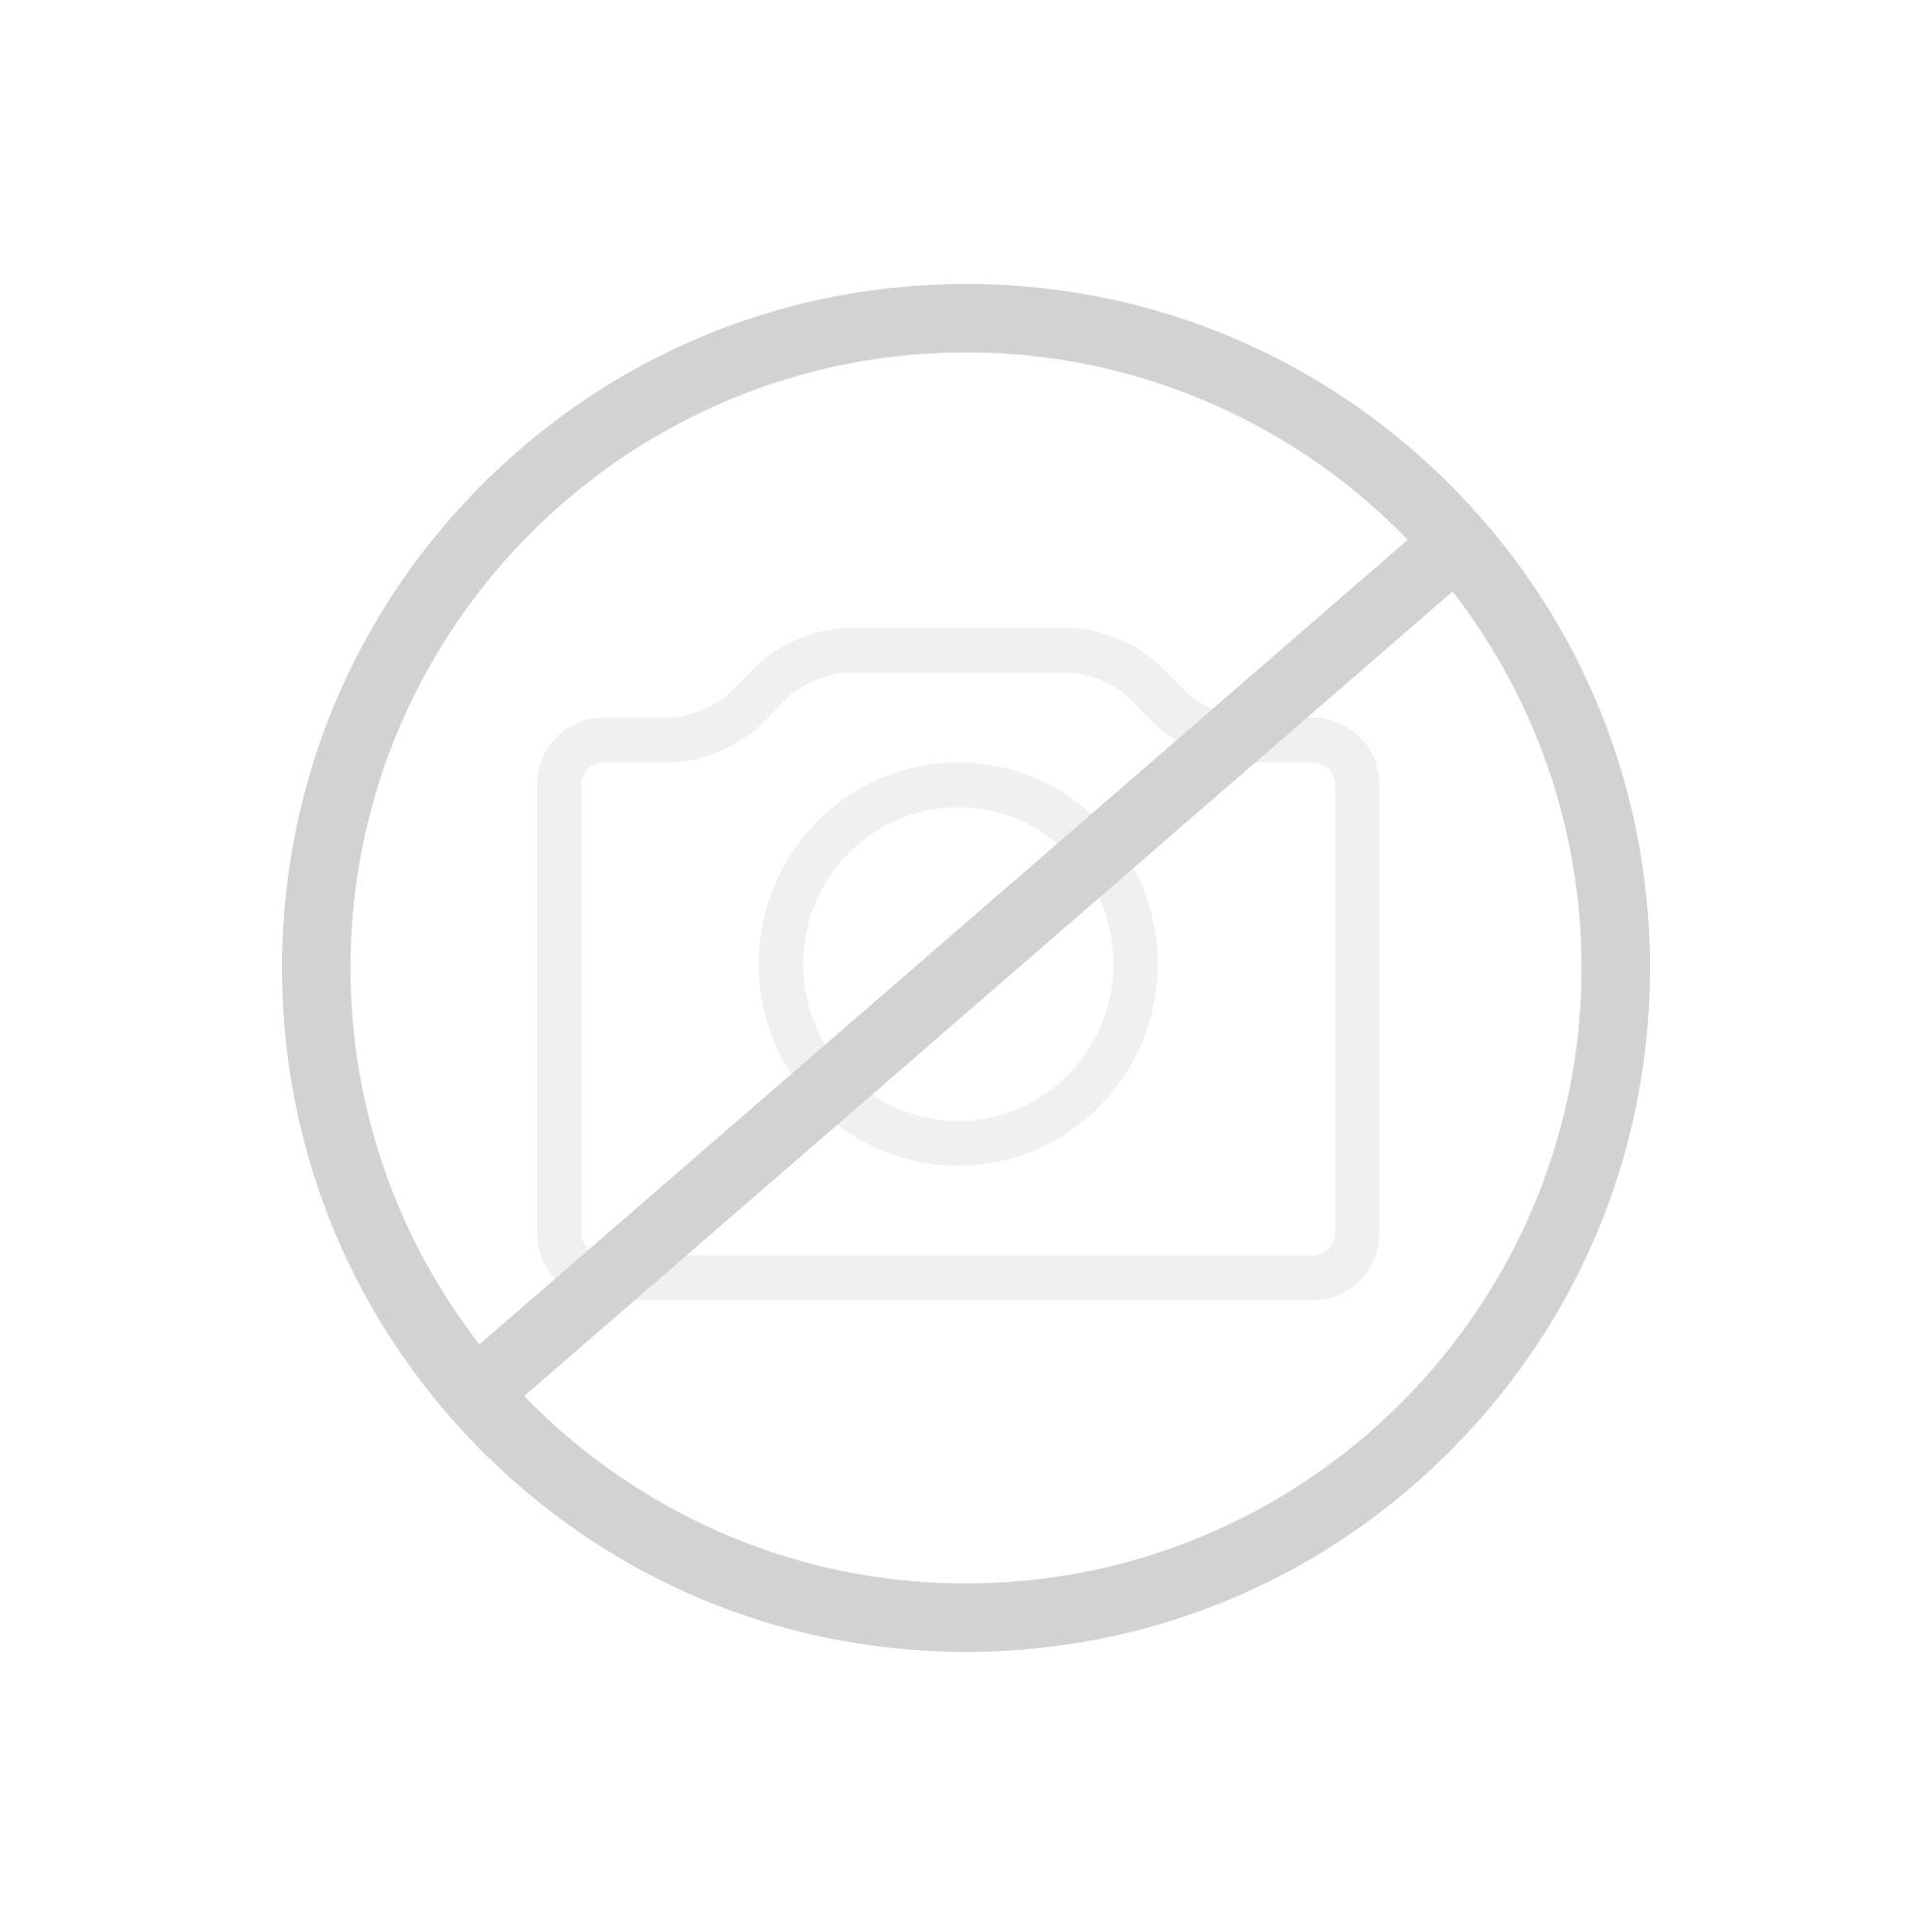 Hansgrohe ibox universal Grundkörper